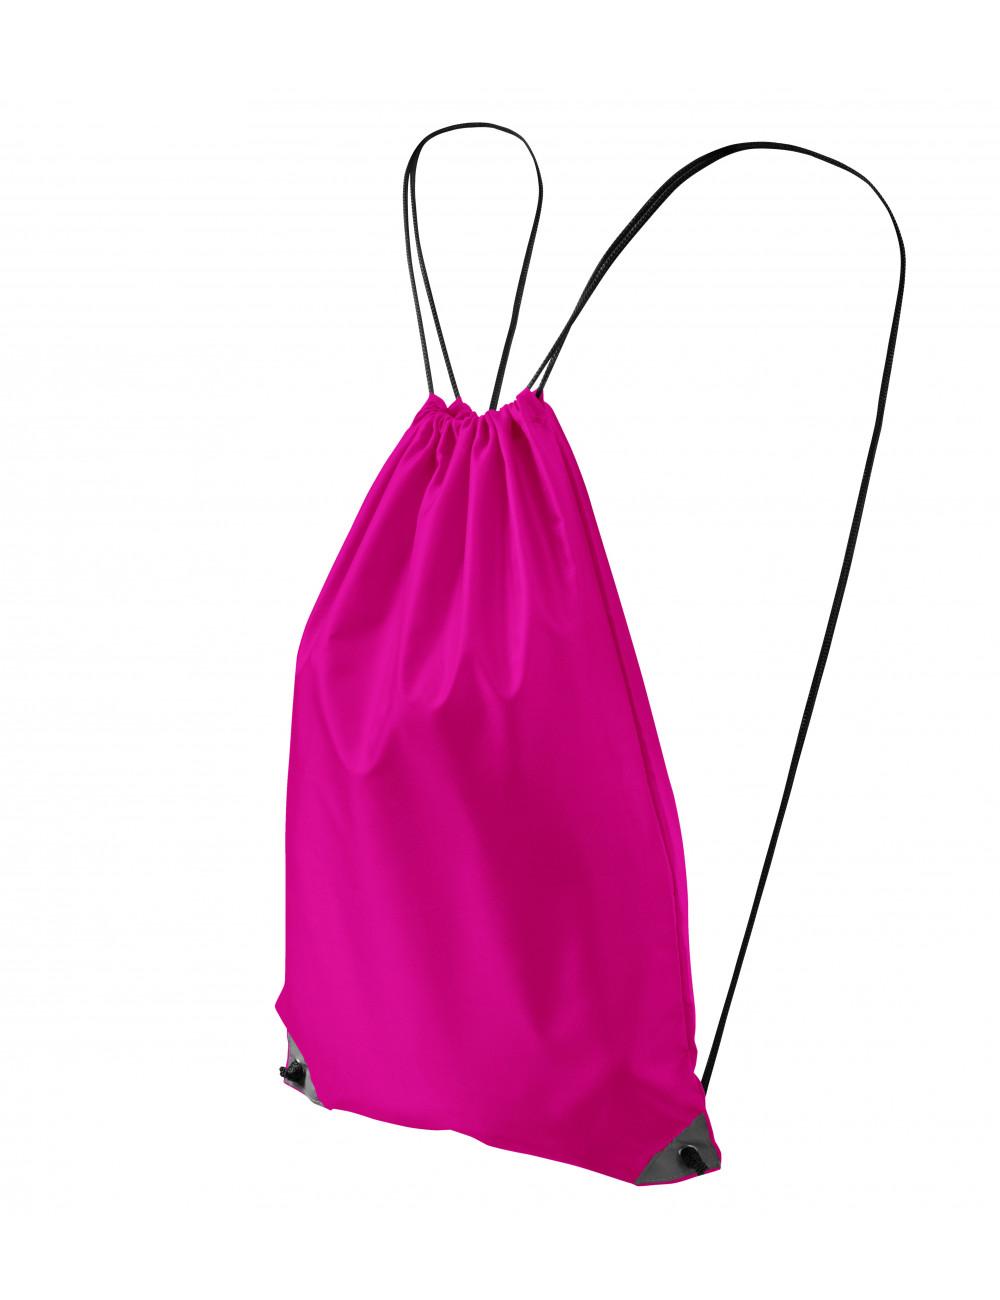 Adler MALFINI Gymsack Unisex/Kids Energy 912 neon różowy